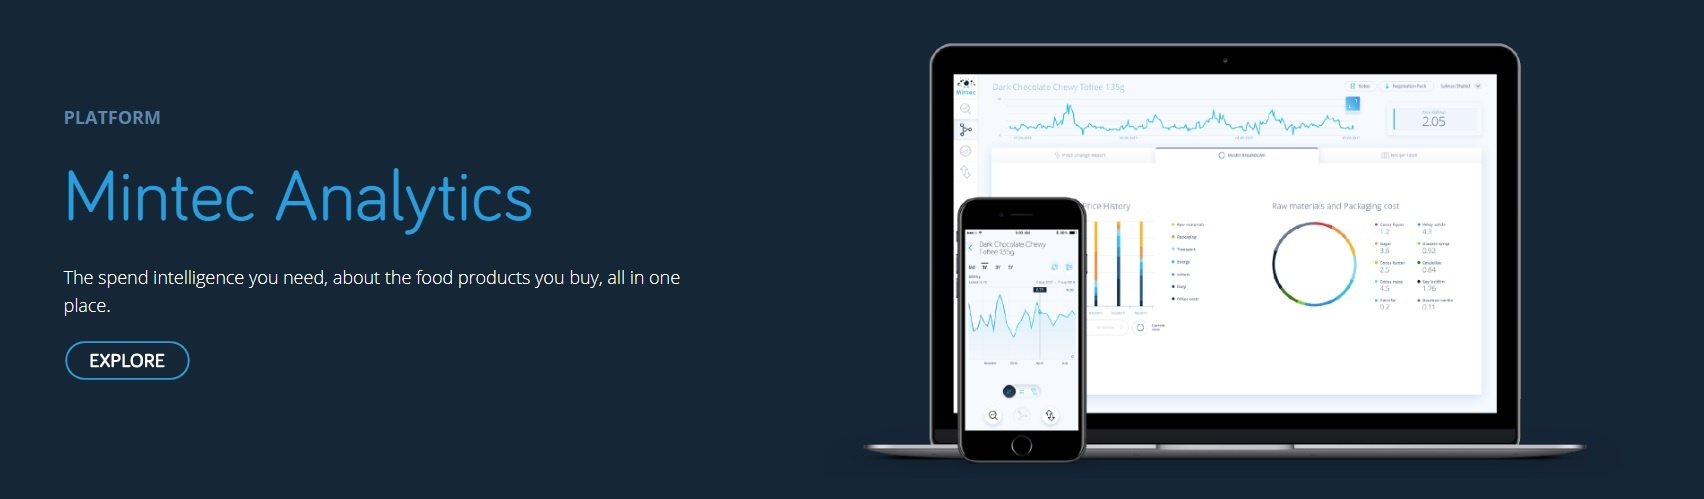 Mintec_Analytics_trial